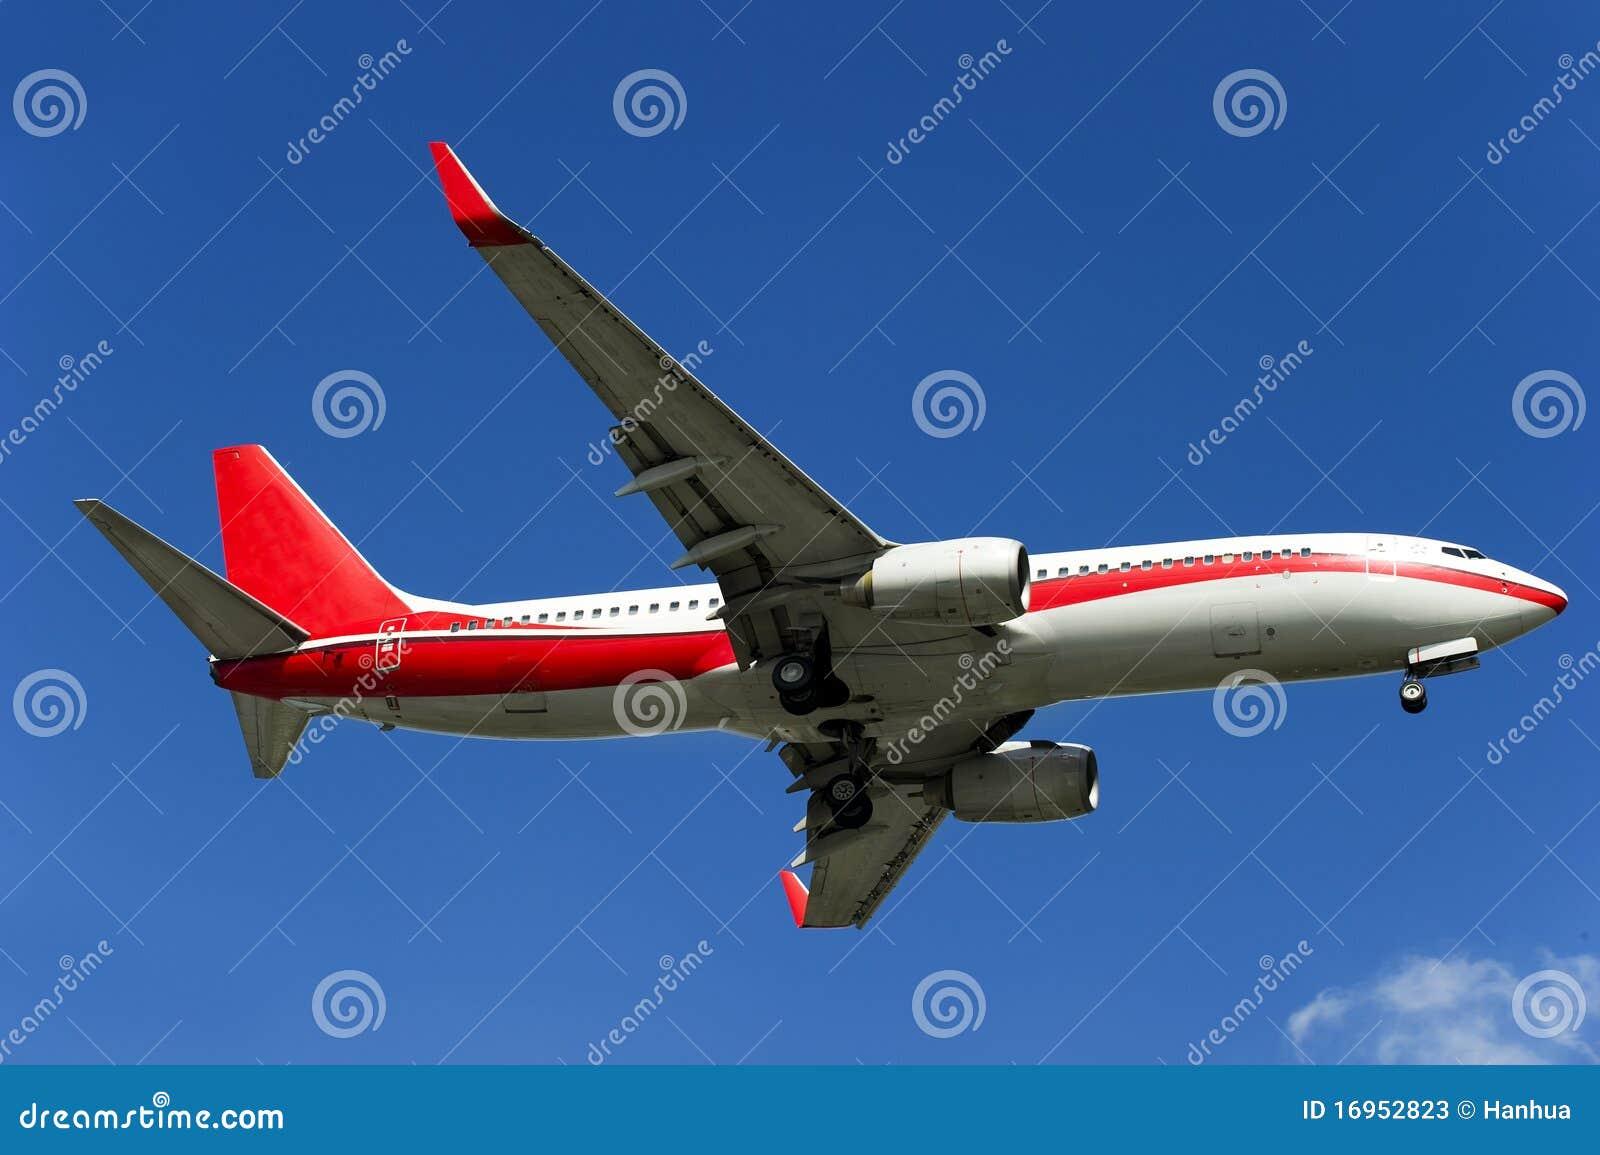 BOEING 737-800 airplane